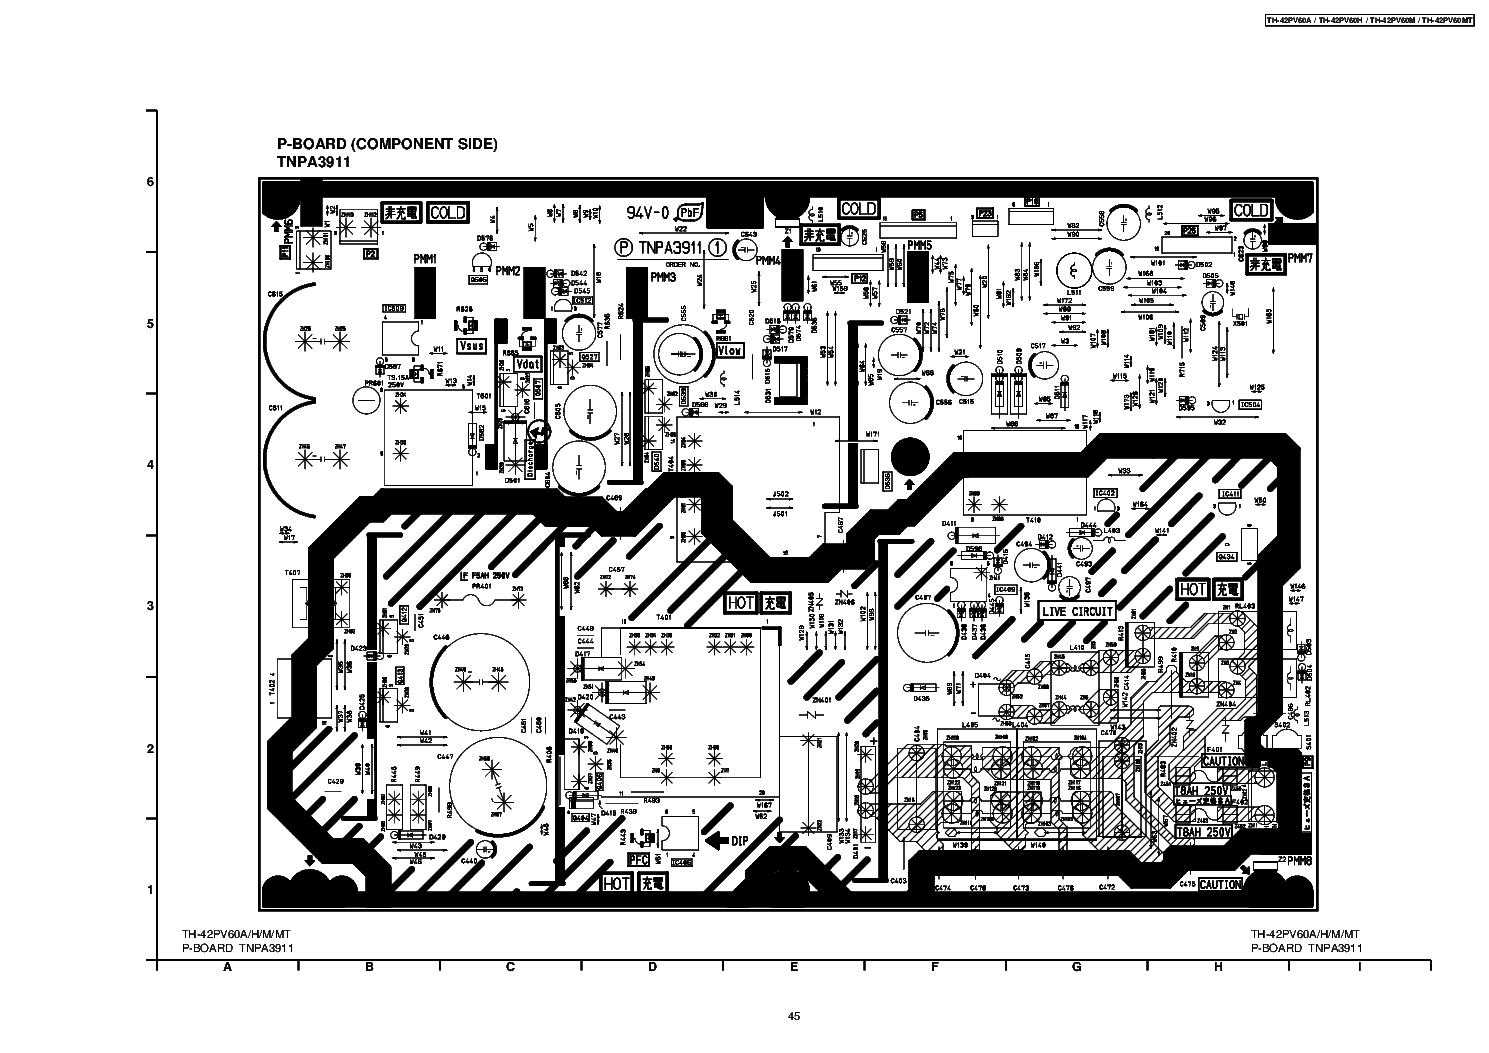 panasonic tnpa3911 1 dkpsu2av0 p-board sch service manual ... power supply schematic #14